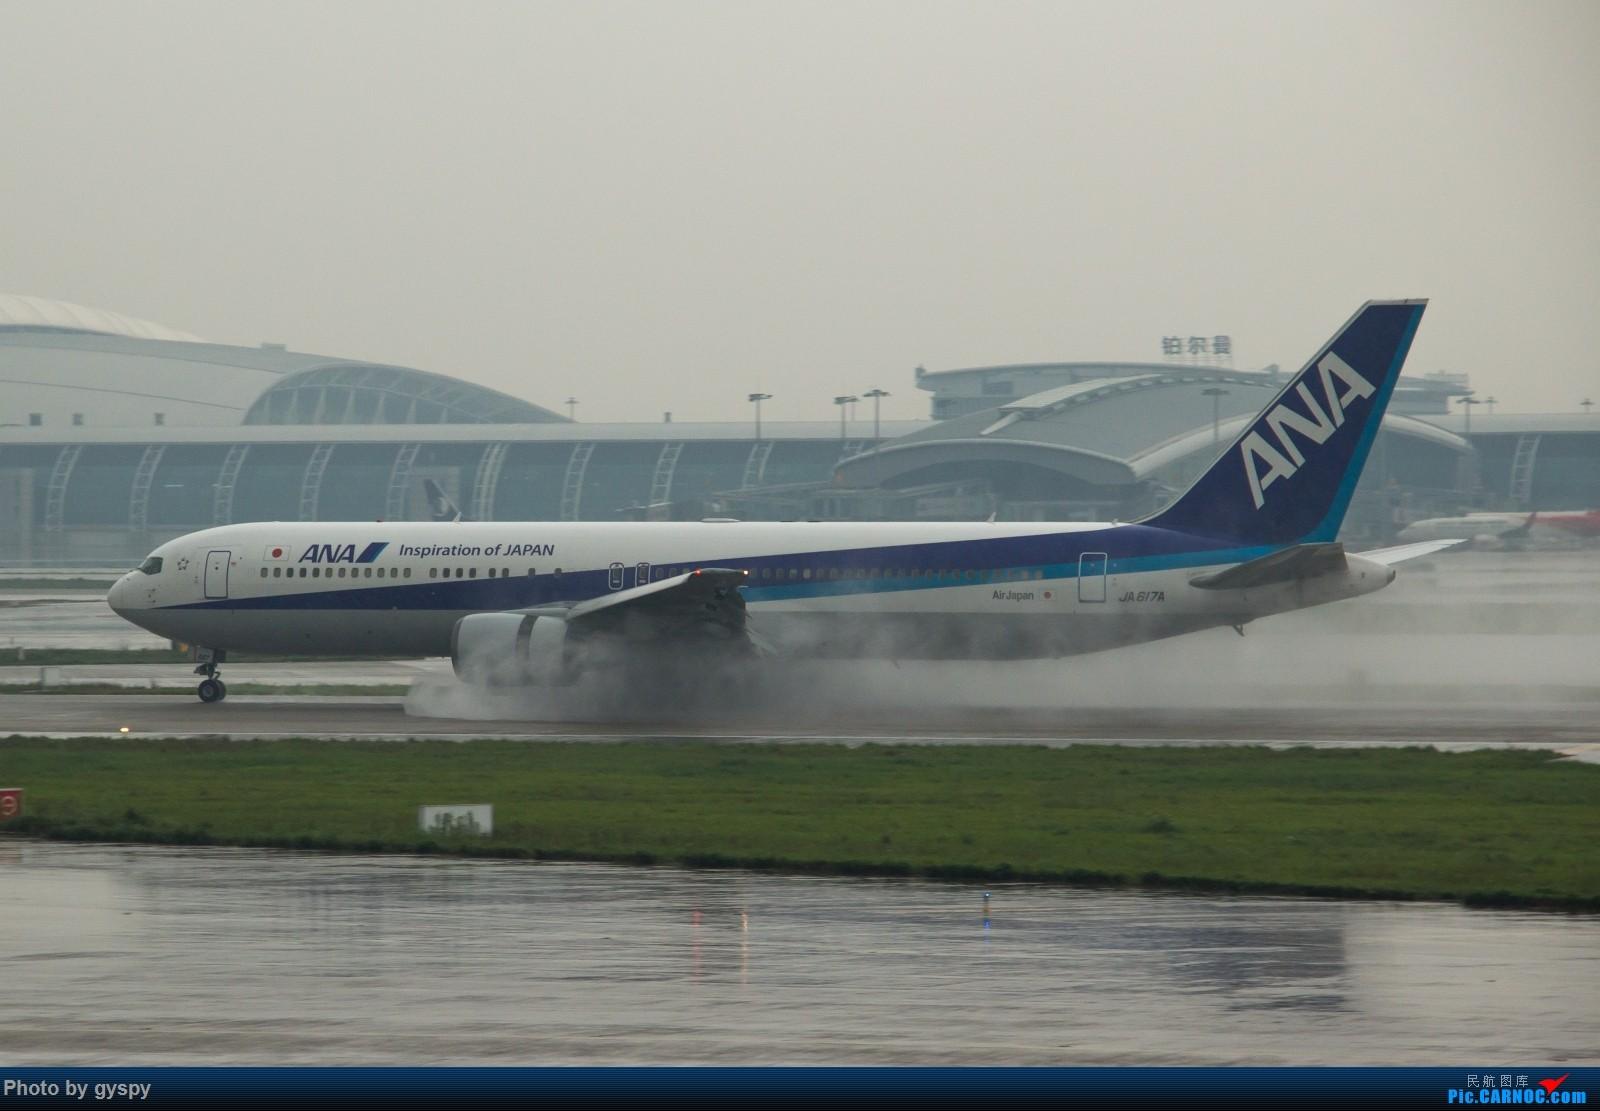 Re:[原创]白云戏水 画质已下线 BOEING 767-300 JA617A 中国广州白云国际机场